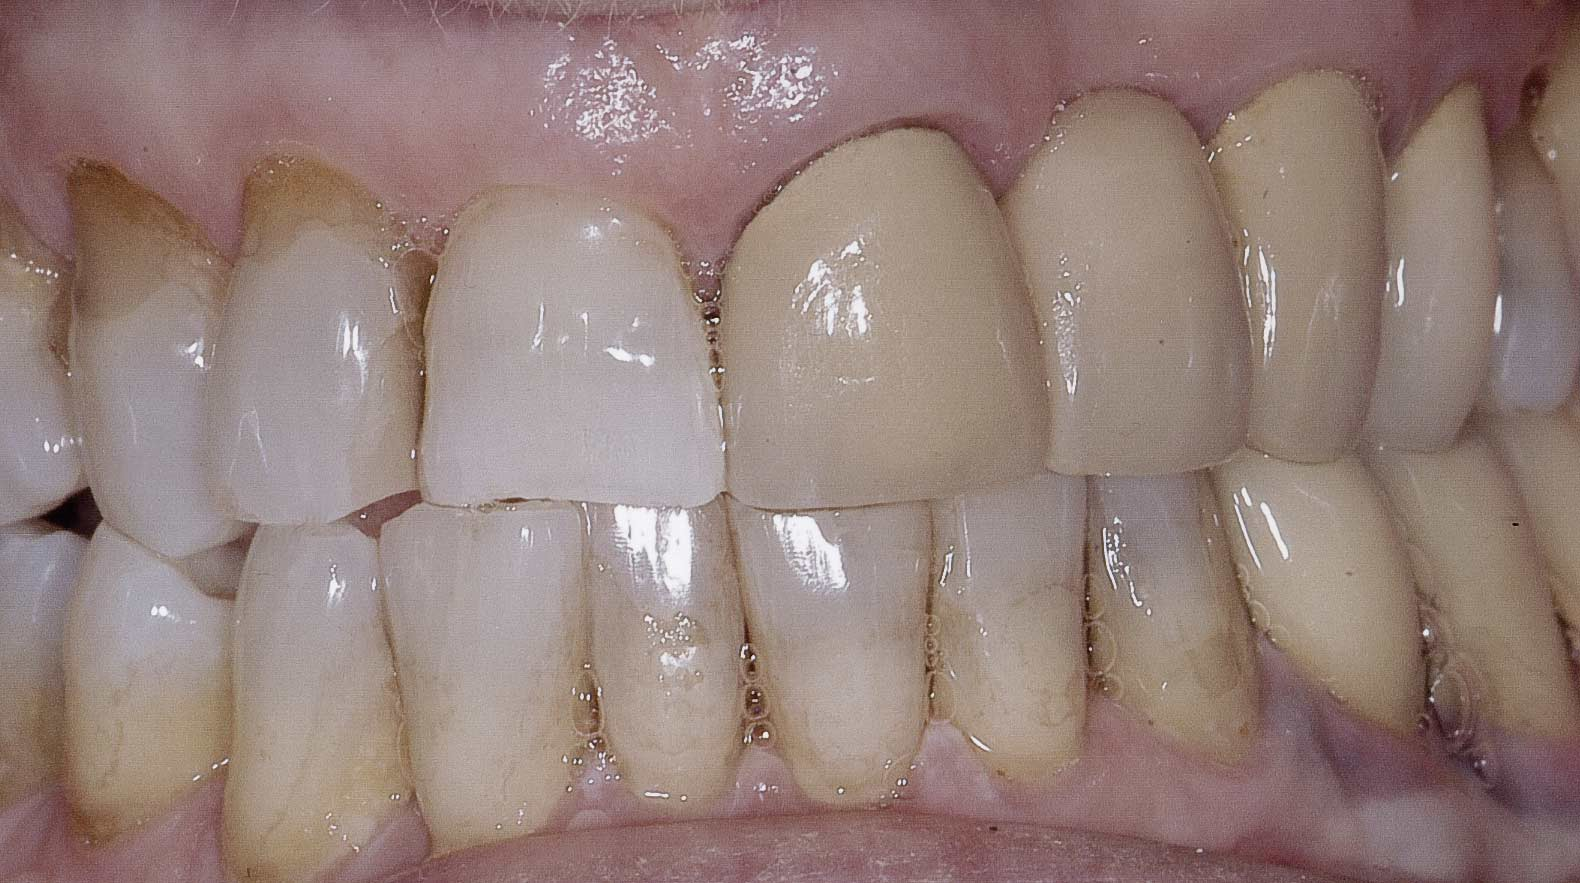 Before restorative dentistry